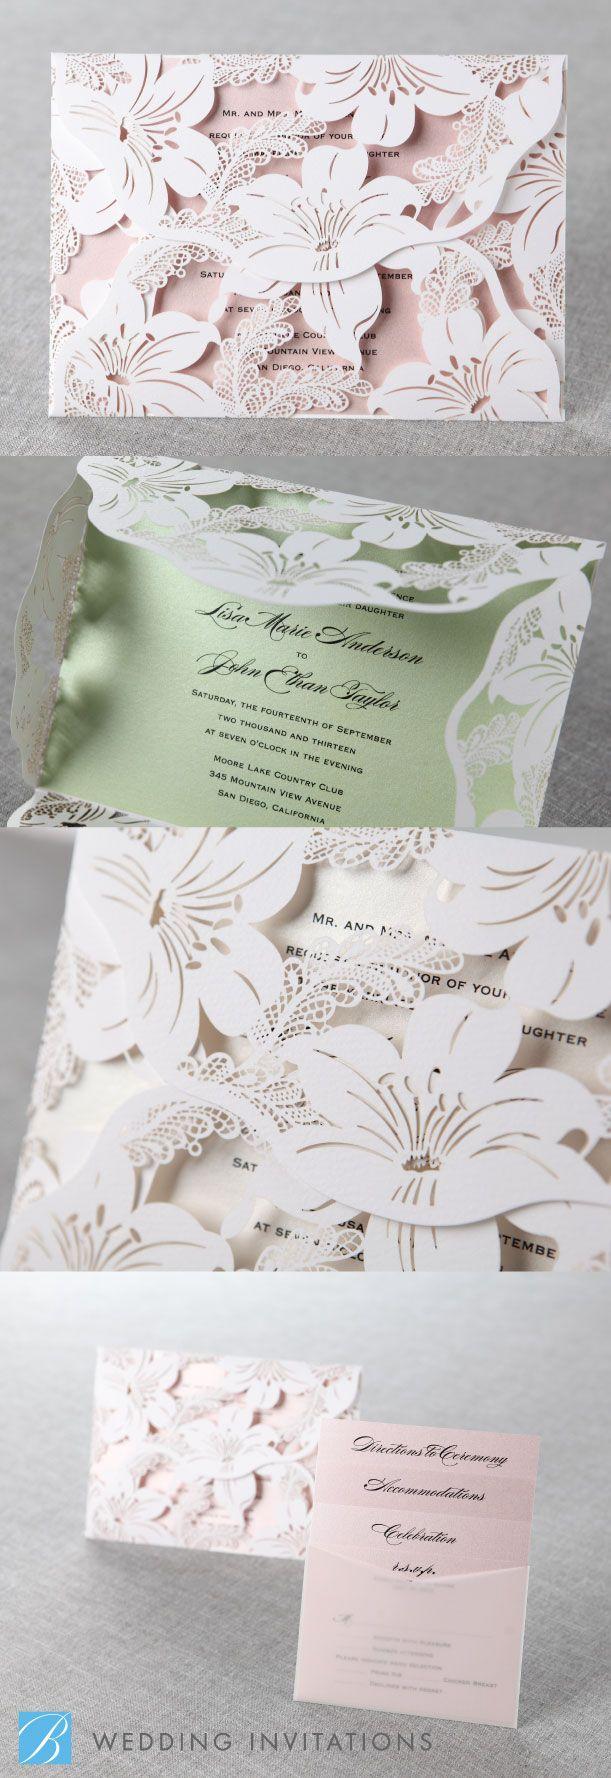 Stunning Lily Blossoms Laser Cut Wrap by B Wedding Invitations #lasercut #invitation.